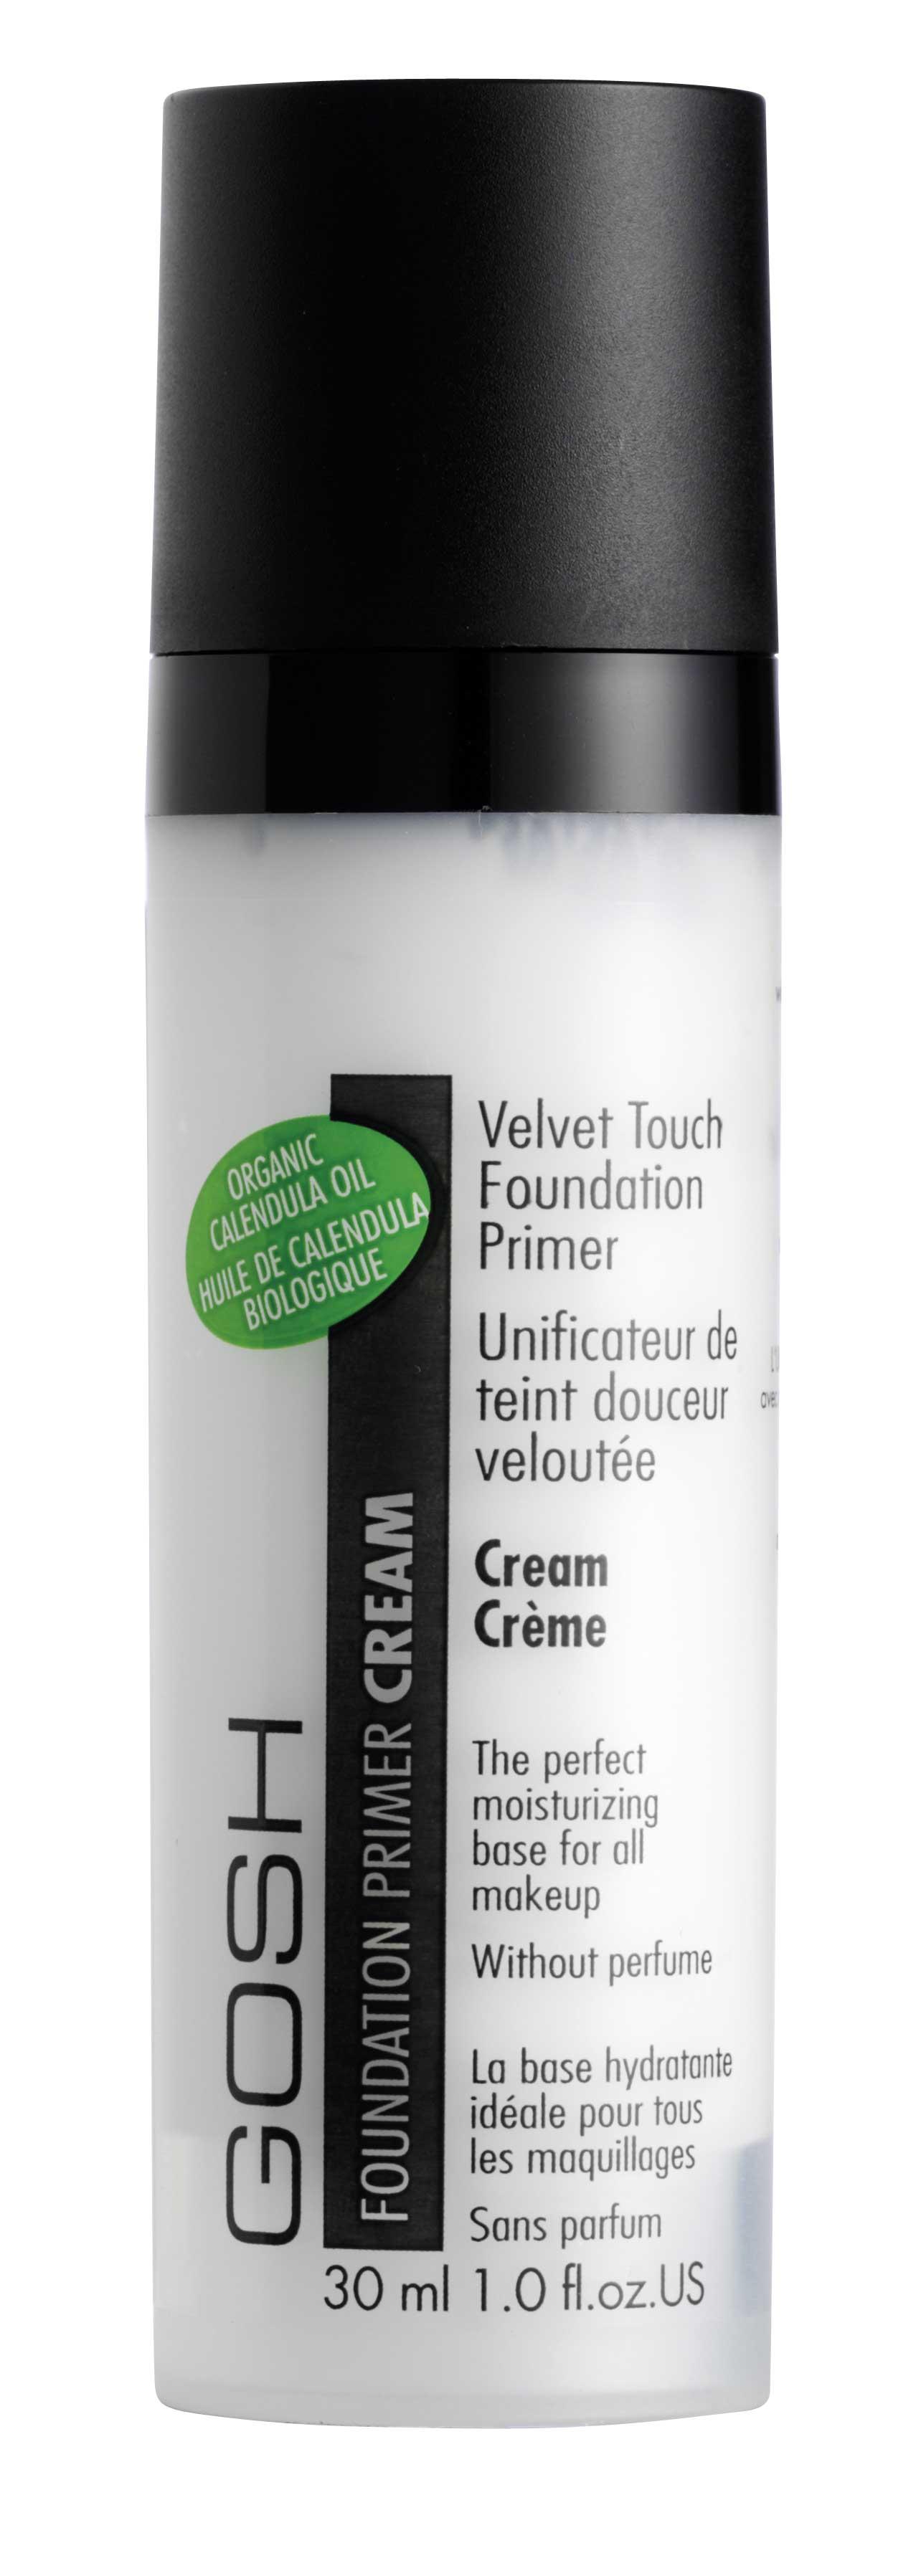 GOSH Velvet Touch Foundation Primer Cream make-up bāze make-up bāze